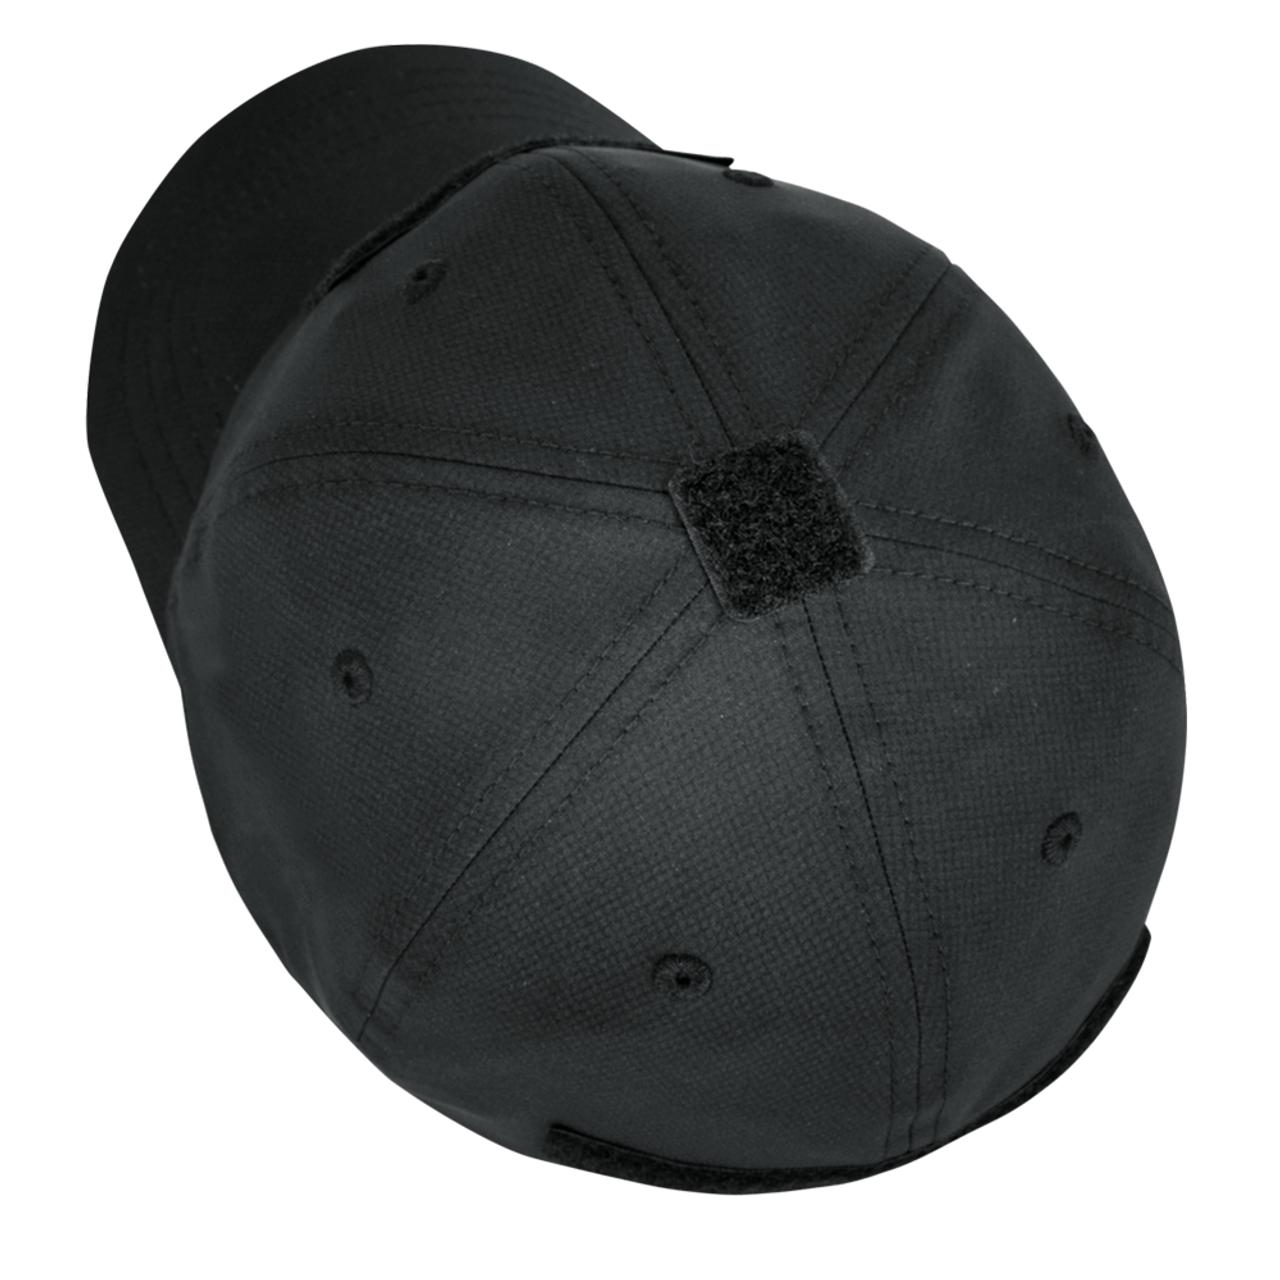 Condor Outdoor 161204 Cool Mesh Tactical Cap, Stretchable performance sweatband, Black